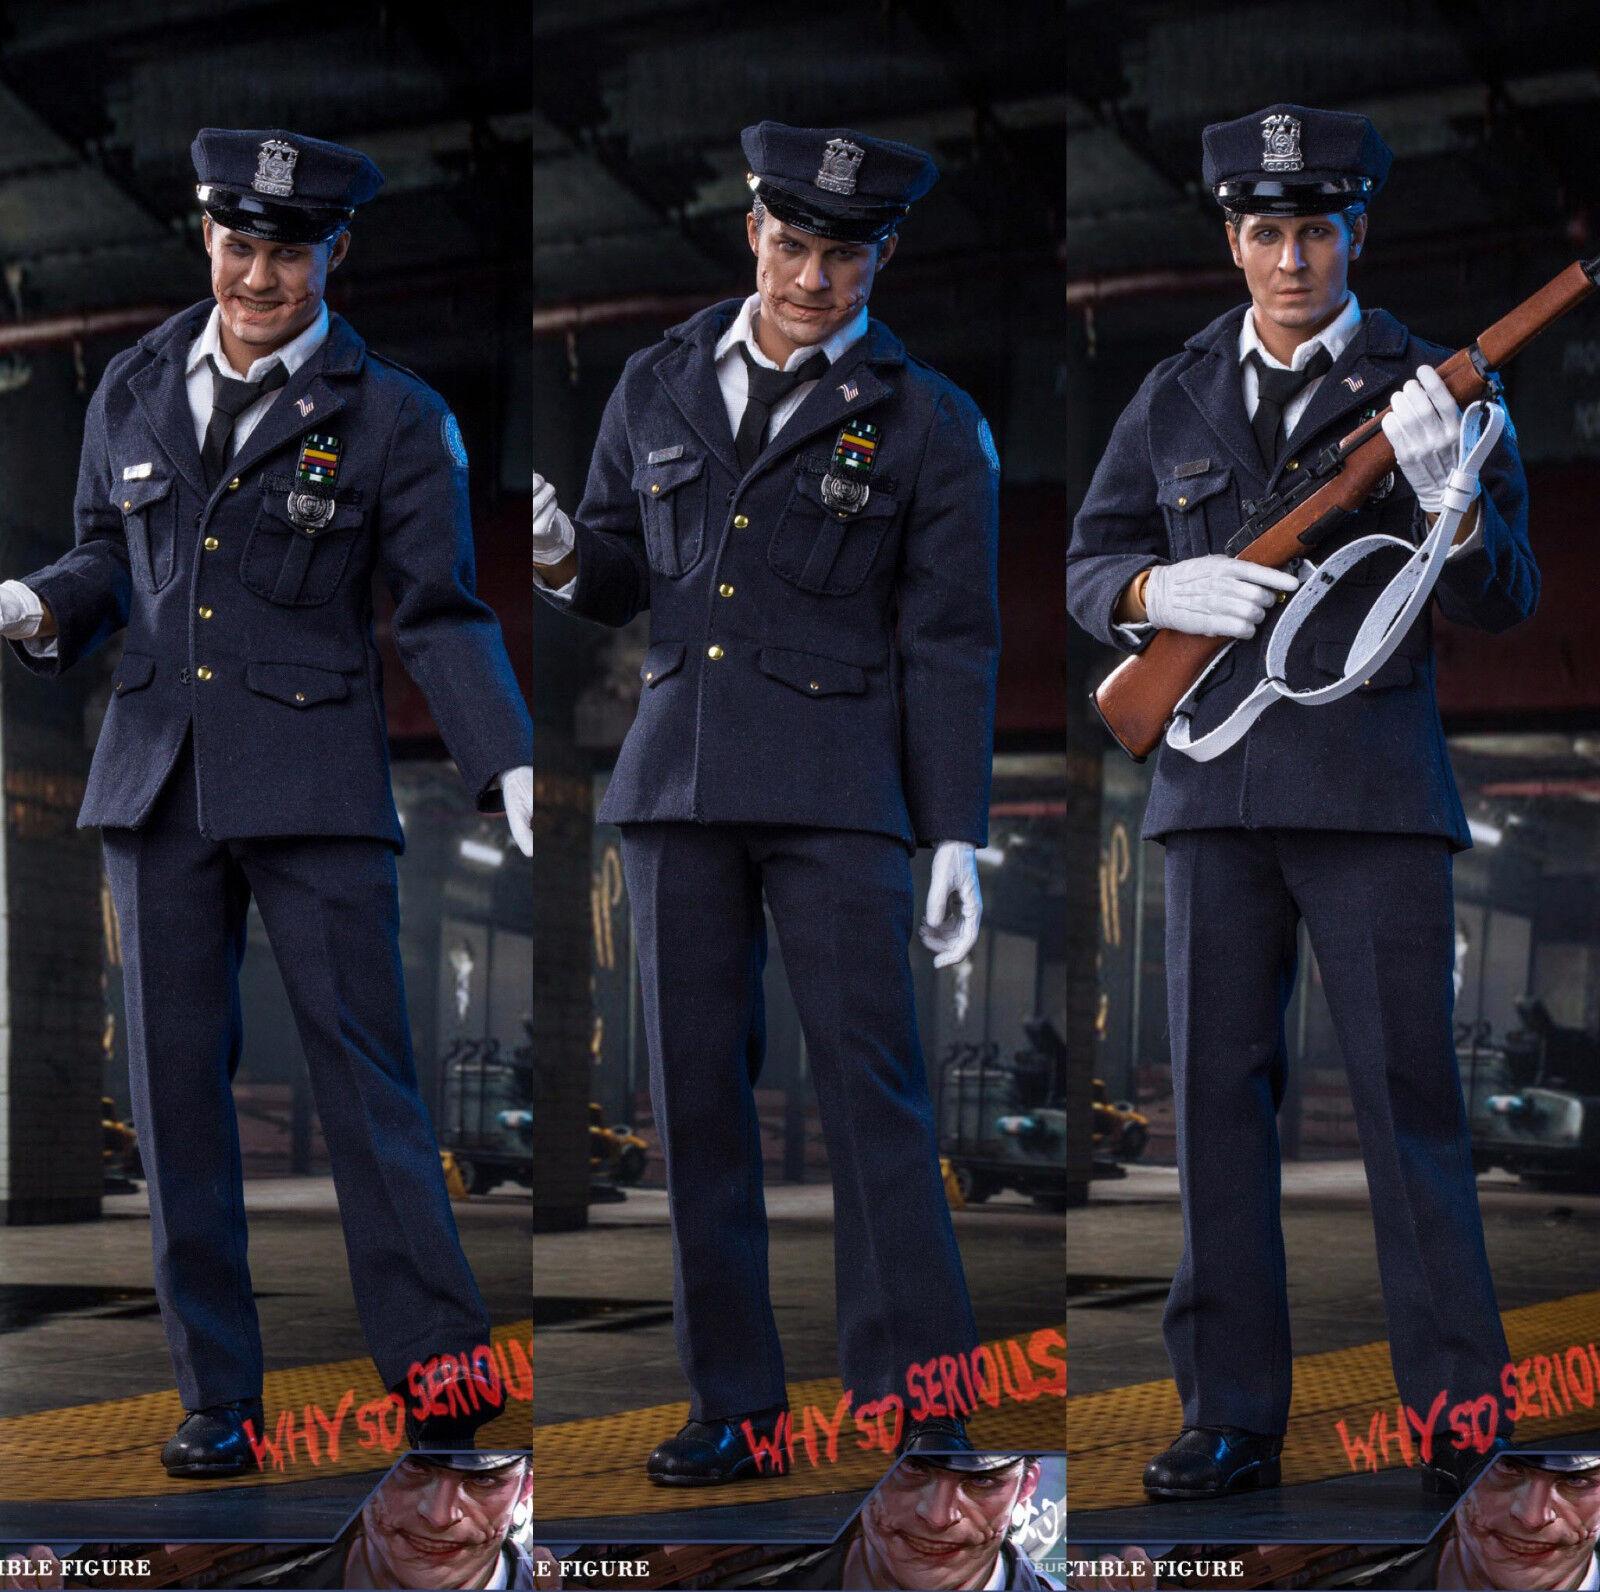 1 6 Police Joker Deluxe Figure USA Dark Knight Knight Batman DX Toys Hot Burning Soul